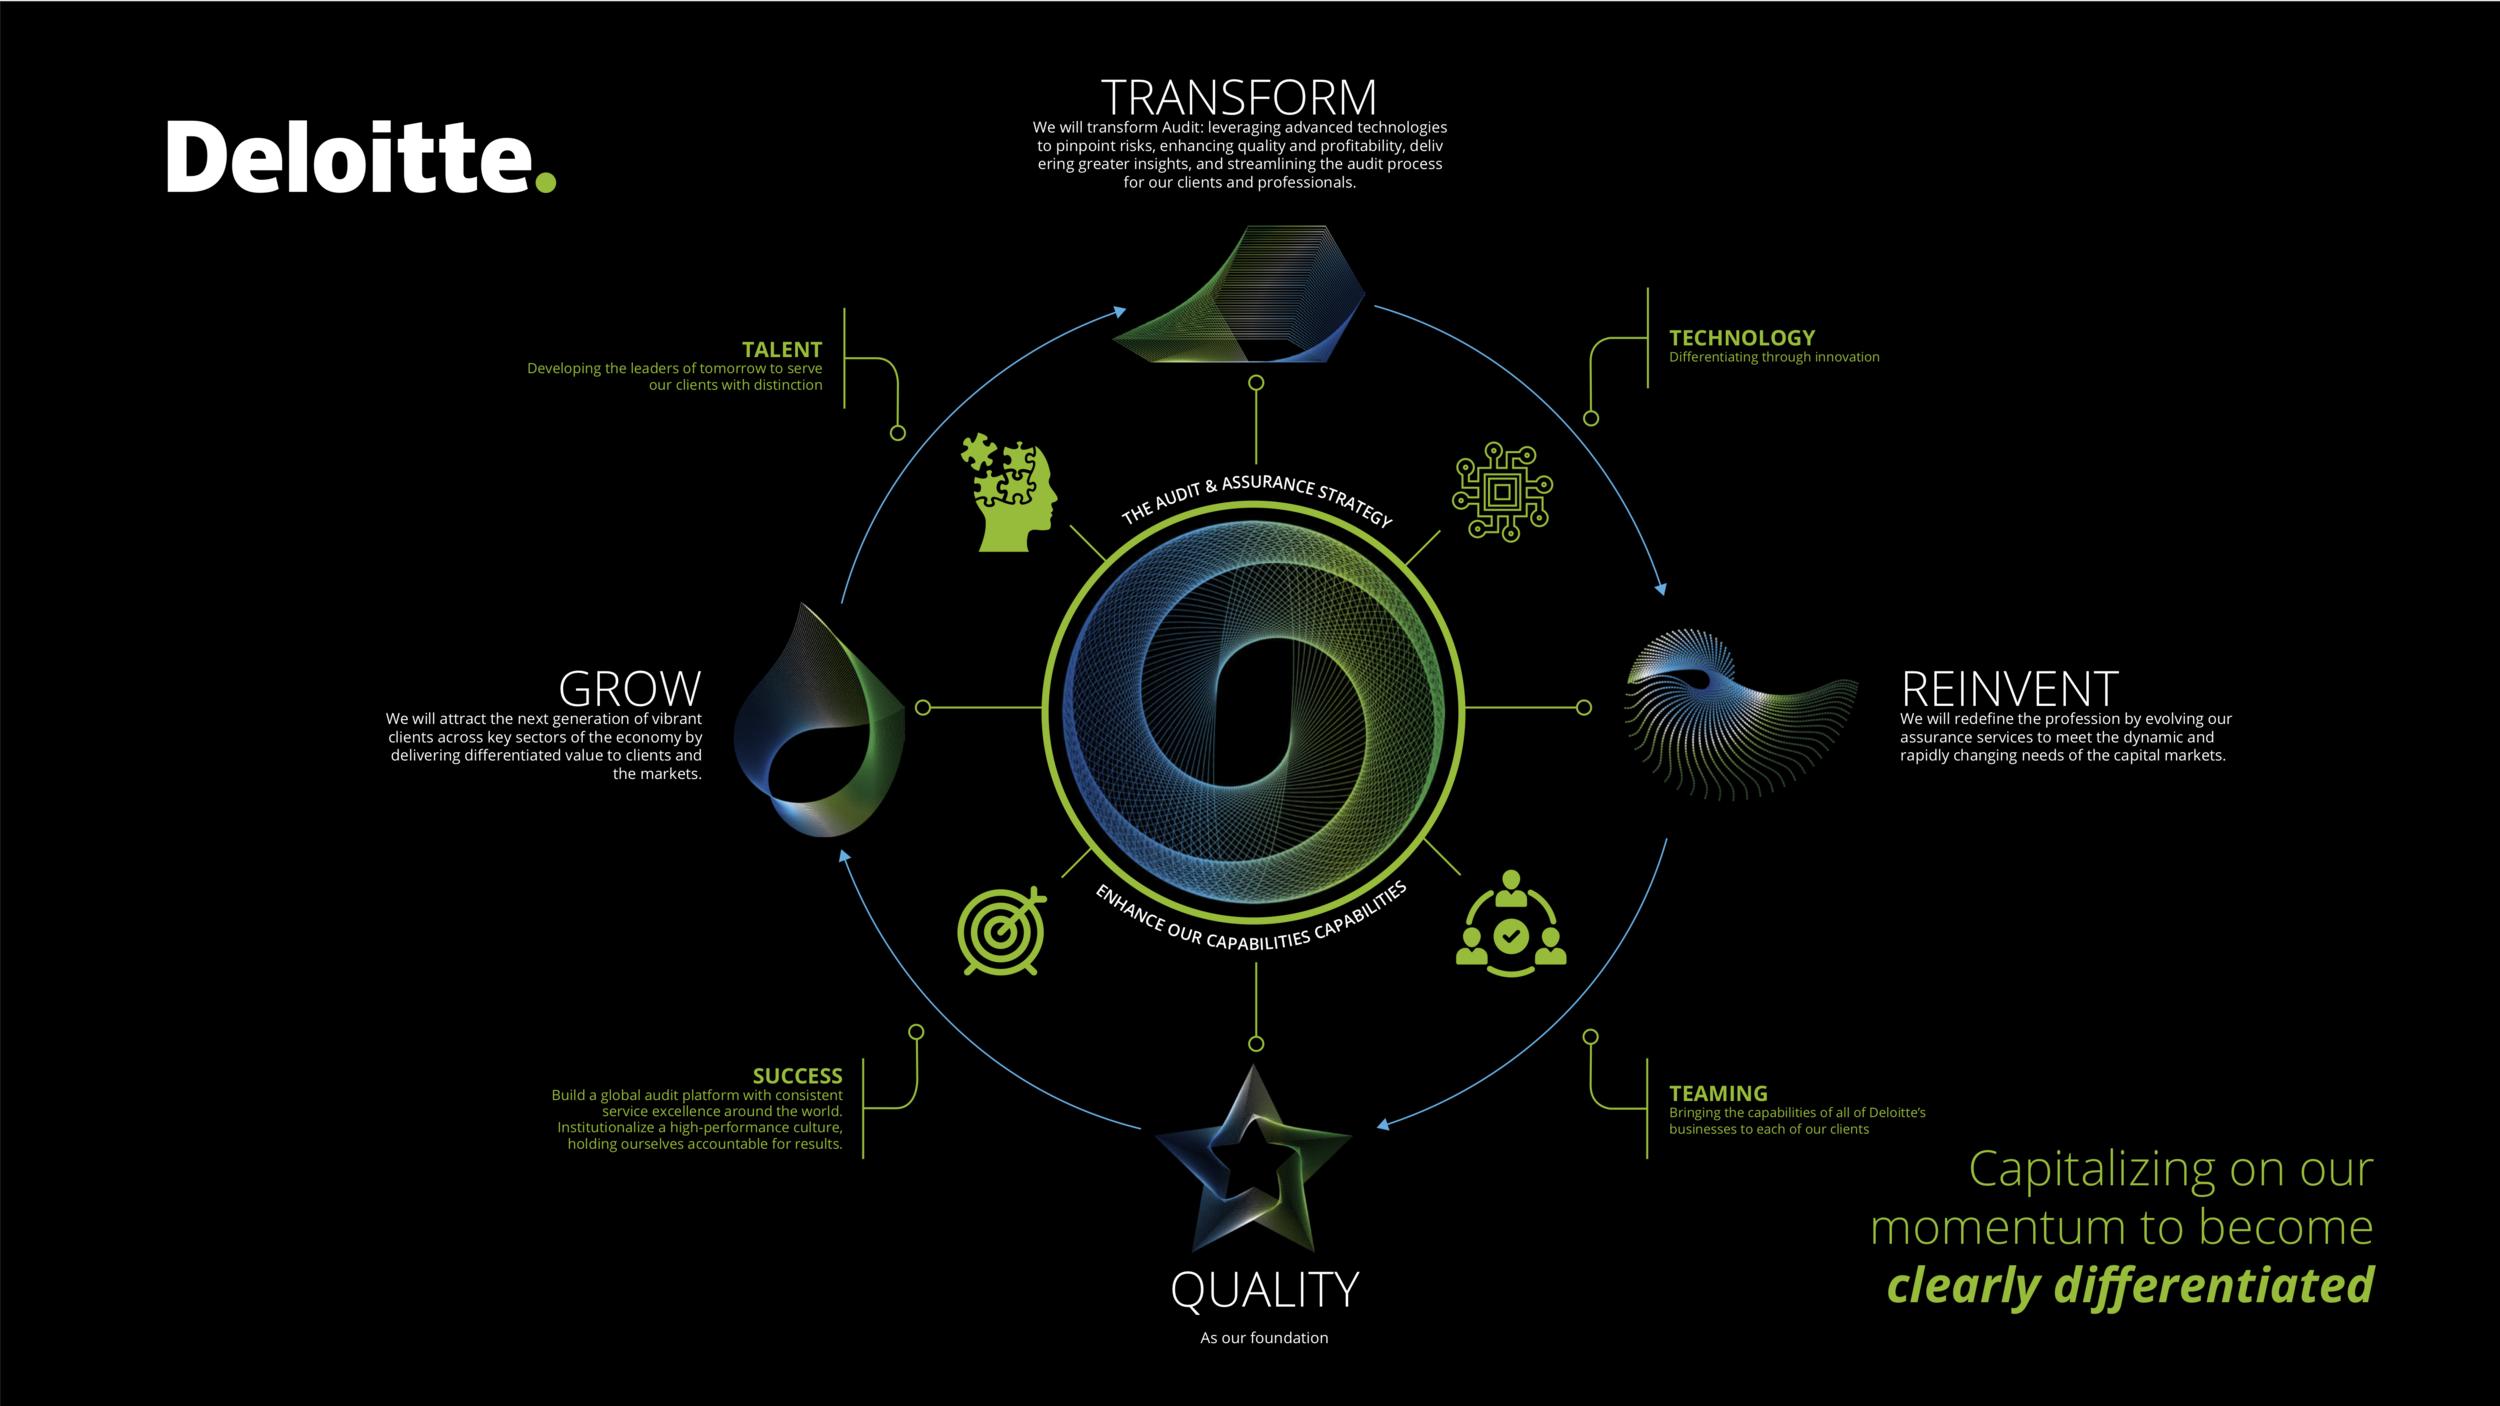 Deloitte / Infographic